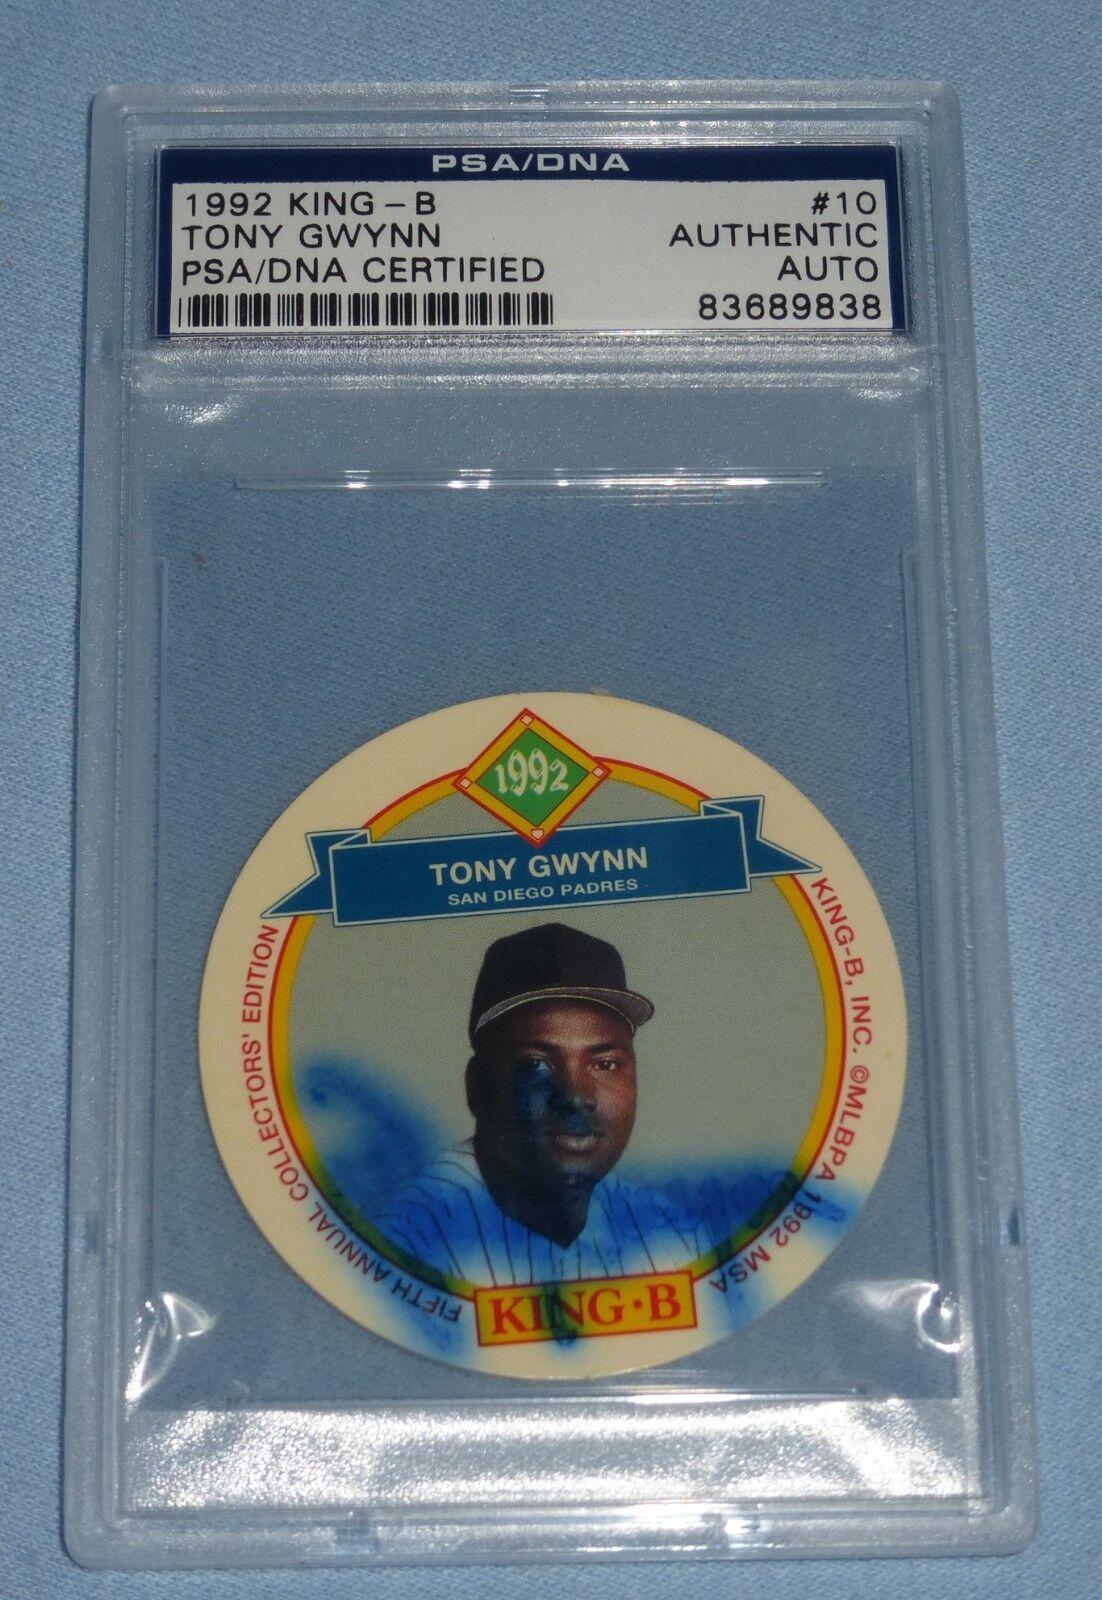 Tony Gwynn Firmado 1992 King-B Béisbol Disco Tarjetas 10 PSA DNA COA Padres